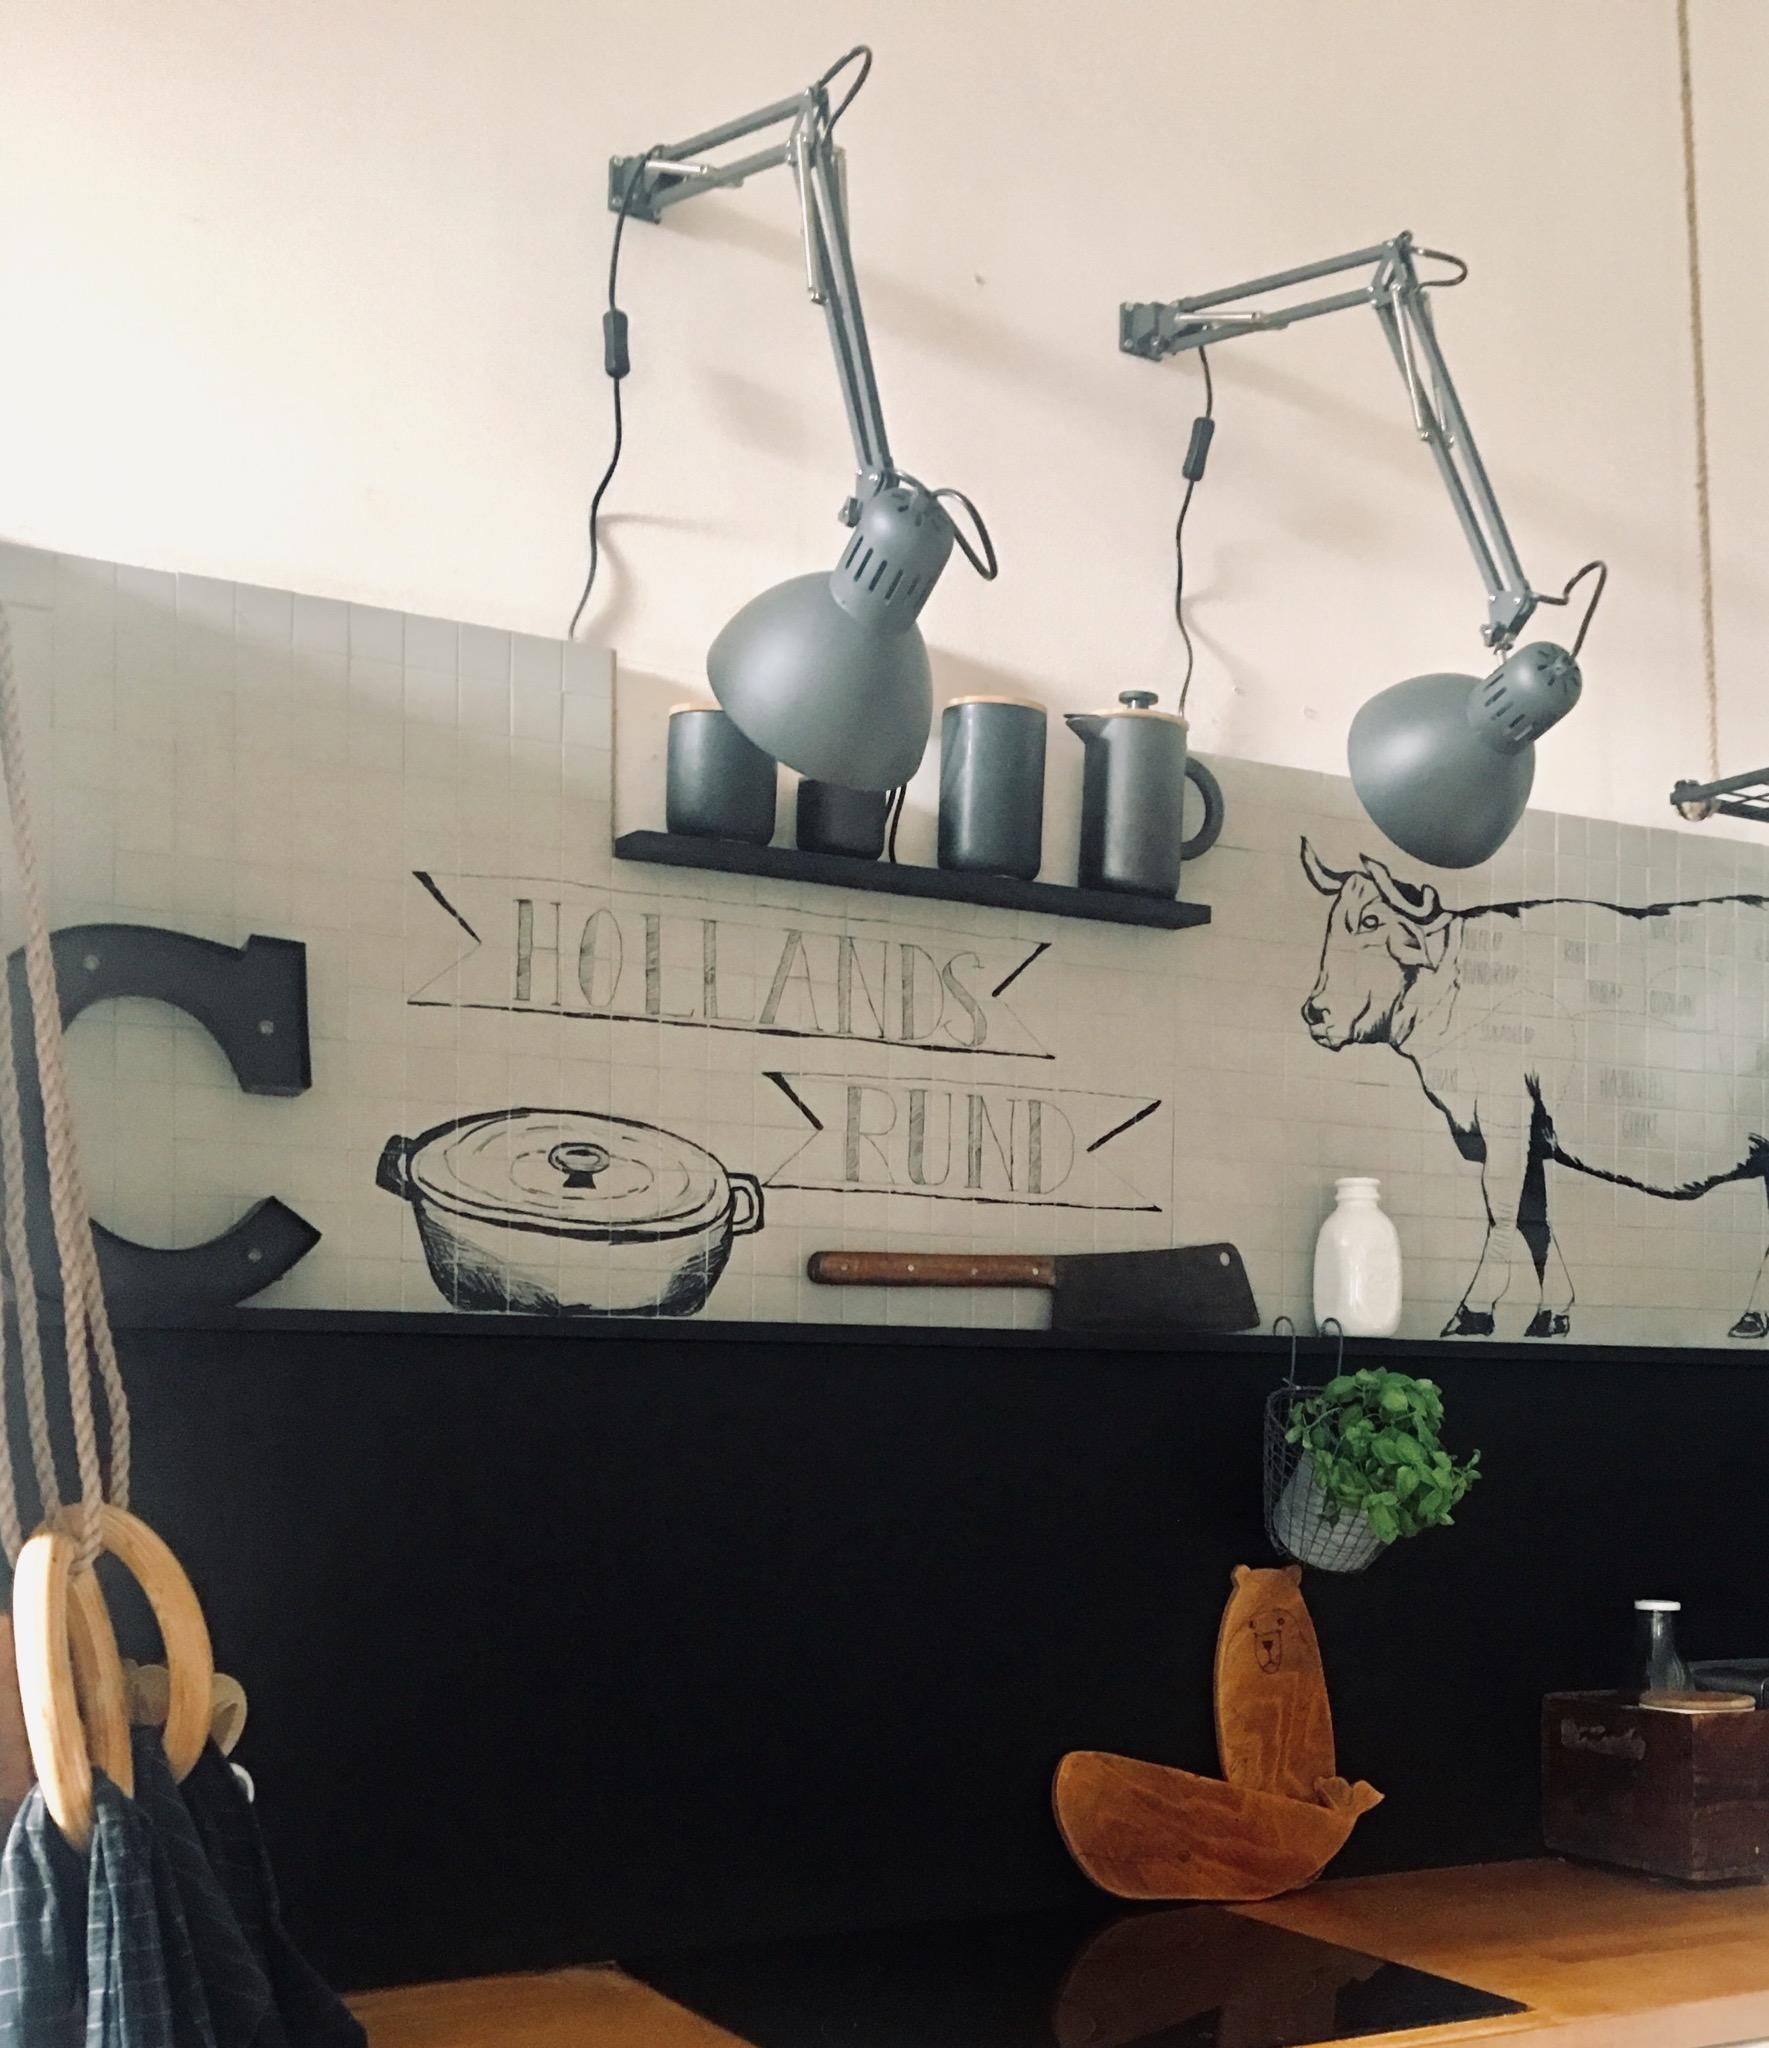 Full Size of Fliesen Rückwand Küche Ausaltmachneukcherckwandfliesendiykruterlam Blende Salamander Glas Holz Modern Lüftung Waschbecken Moderne Landhausküche Sideboard Wohnzimmer Fliesen Rückwand Küche